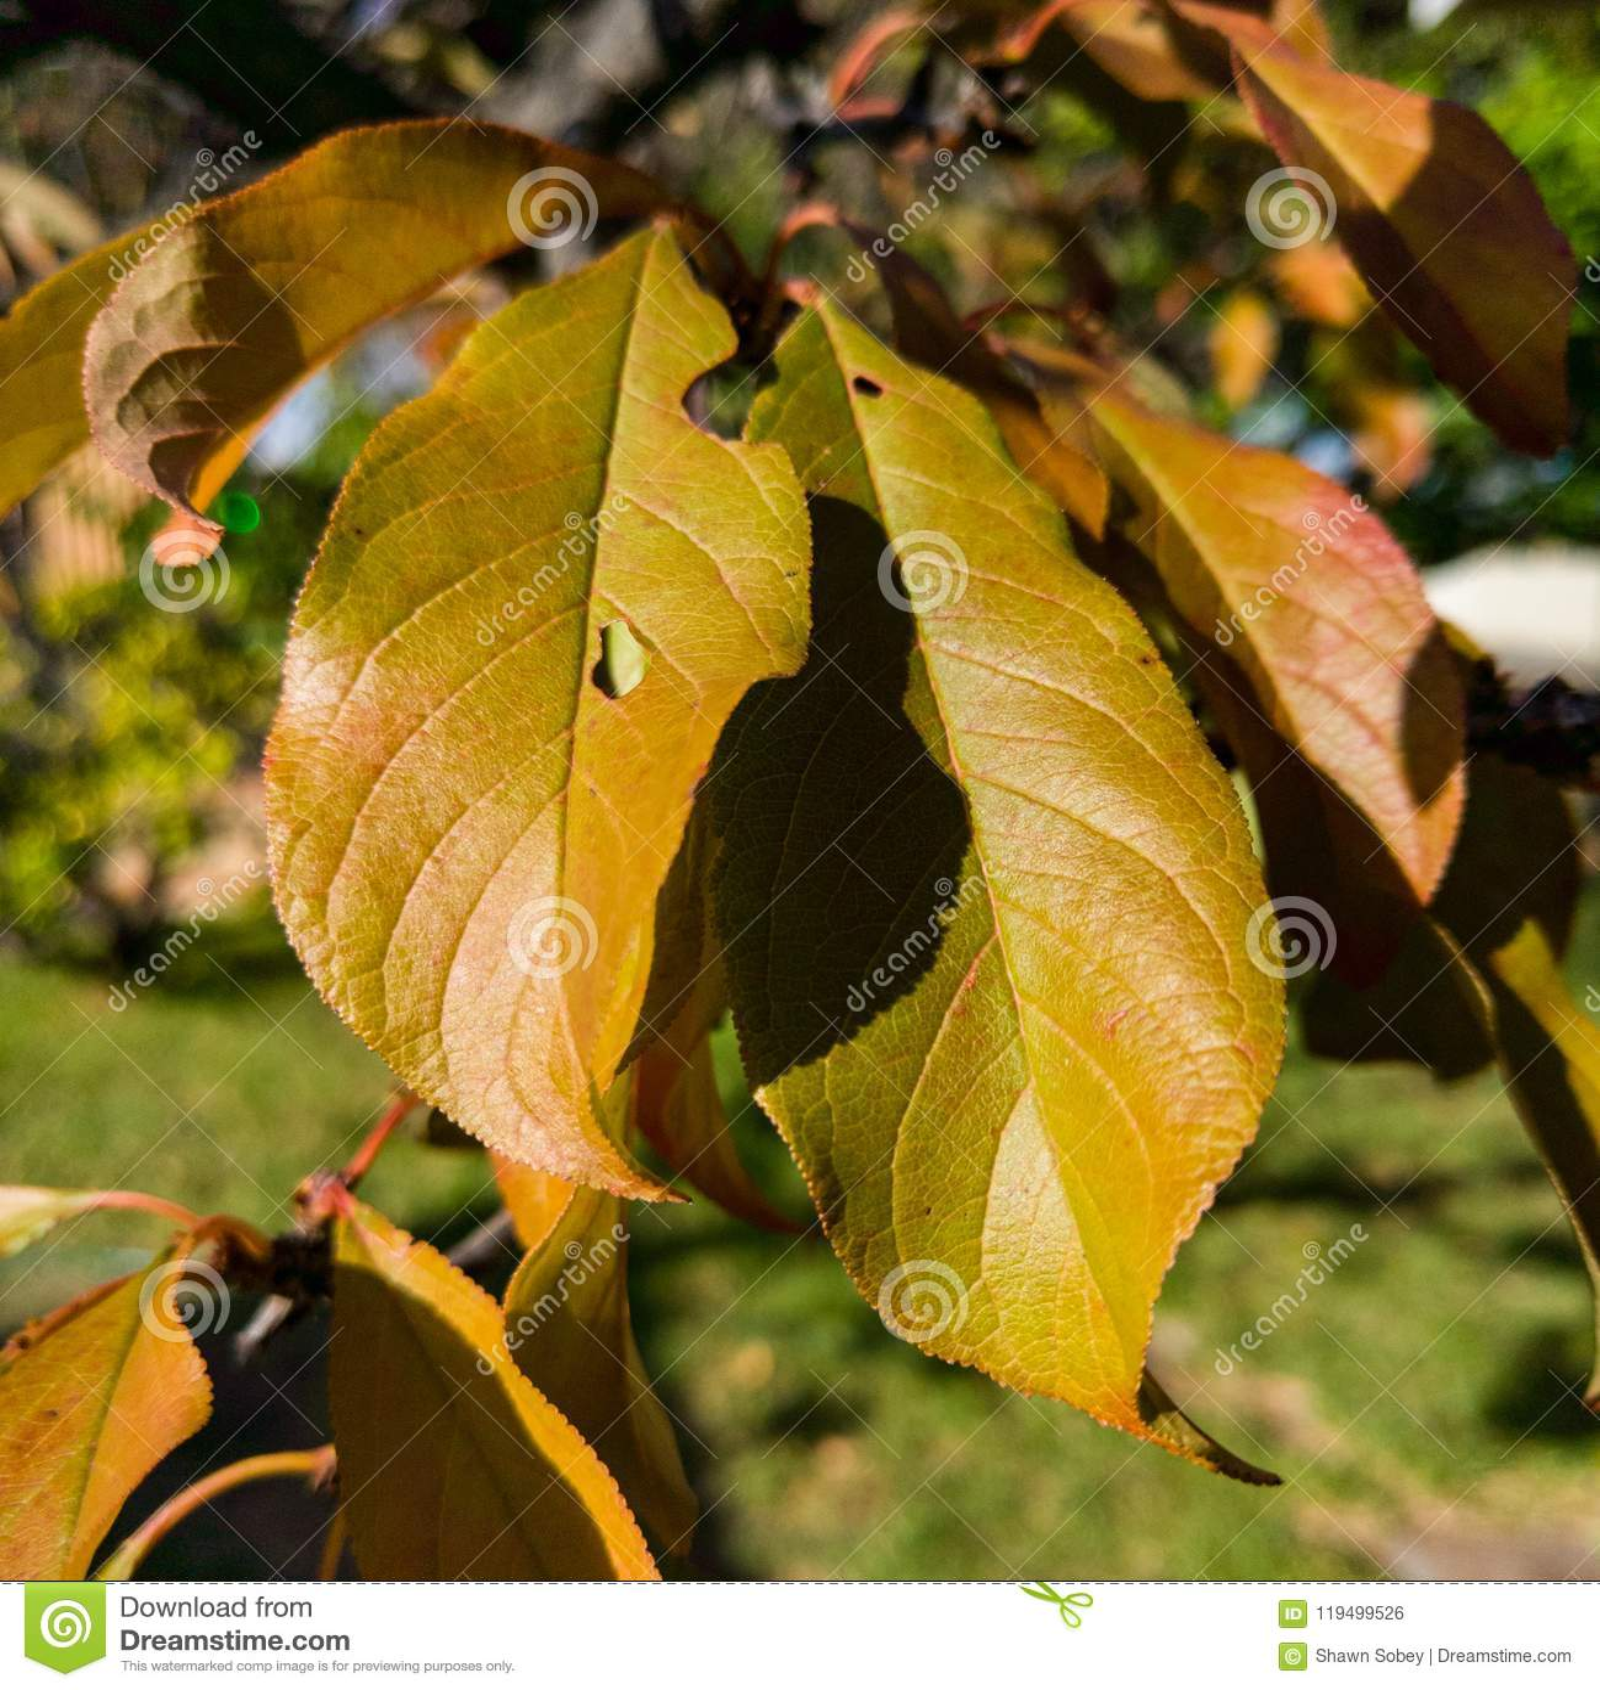 Turning Leaves Stock Photo Image Of Leaves Turn Autumn 119499526